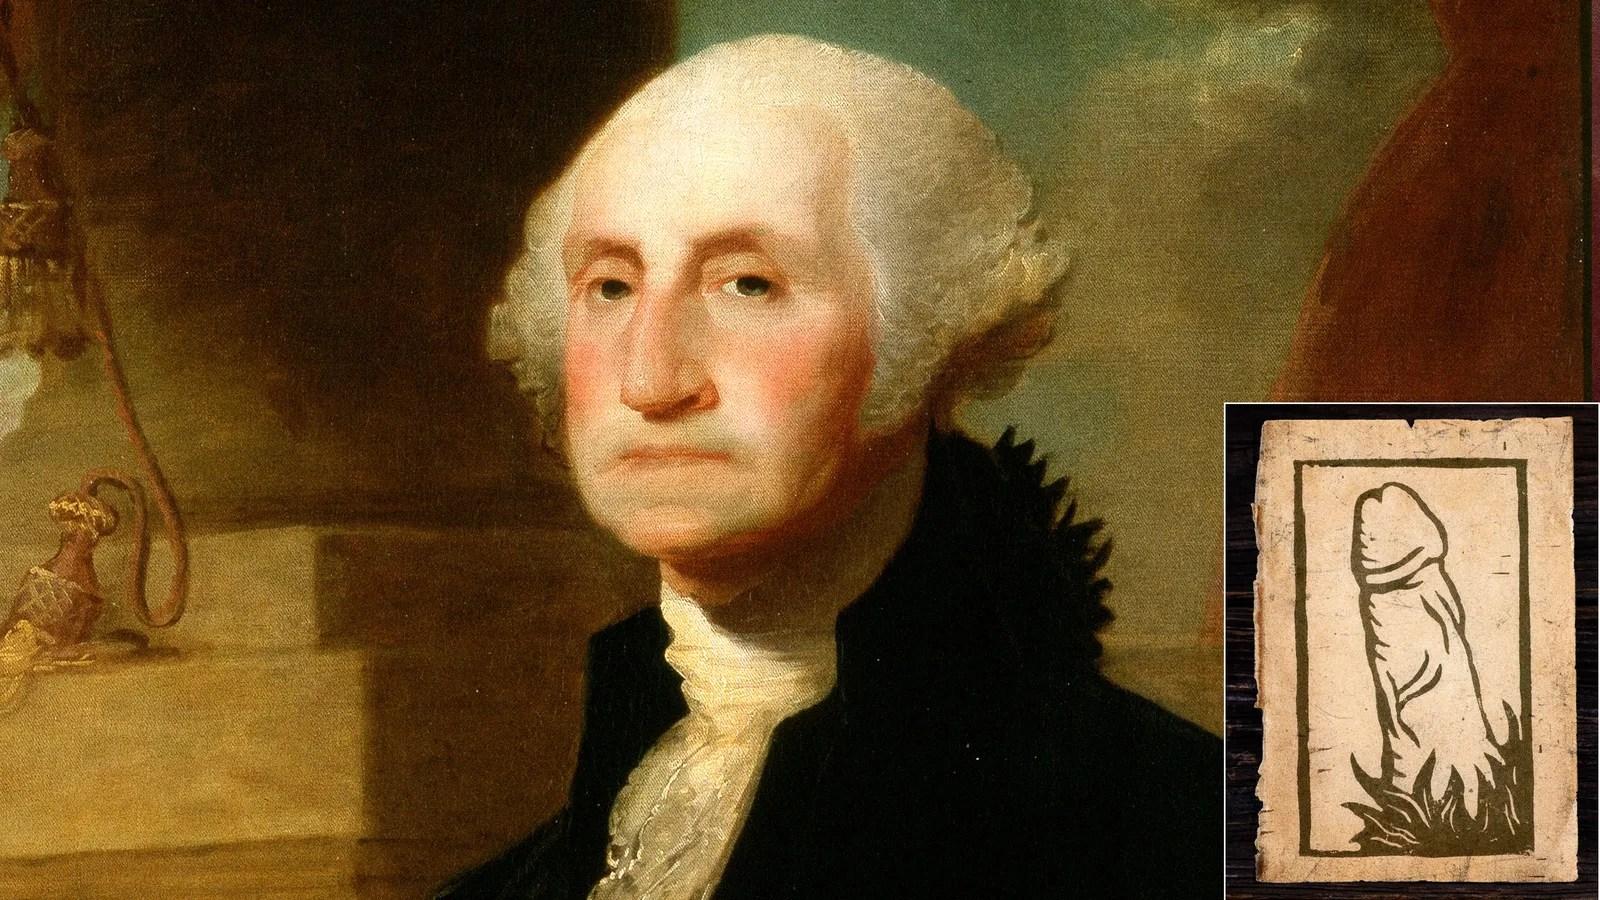 New Evidence Suggests President George Washington Sent Woodcut Of To Secretary